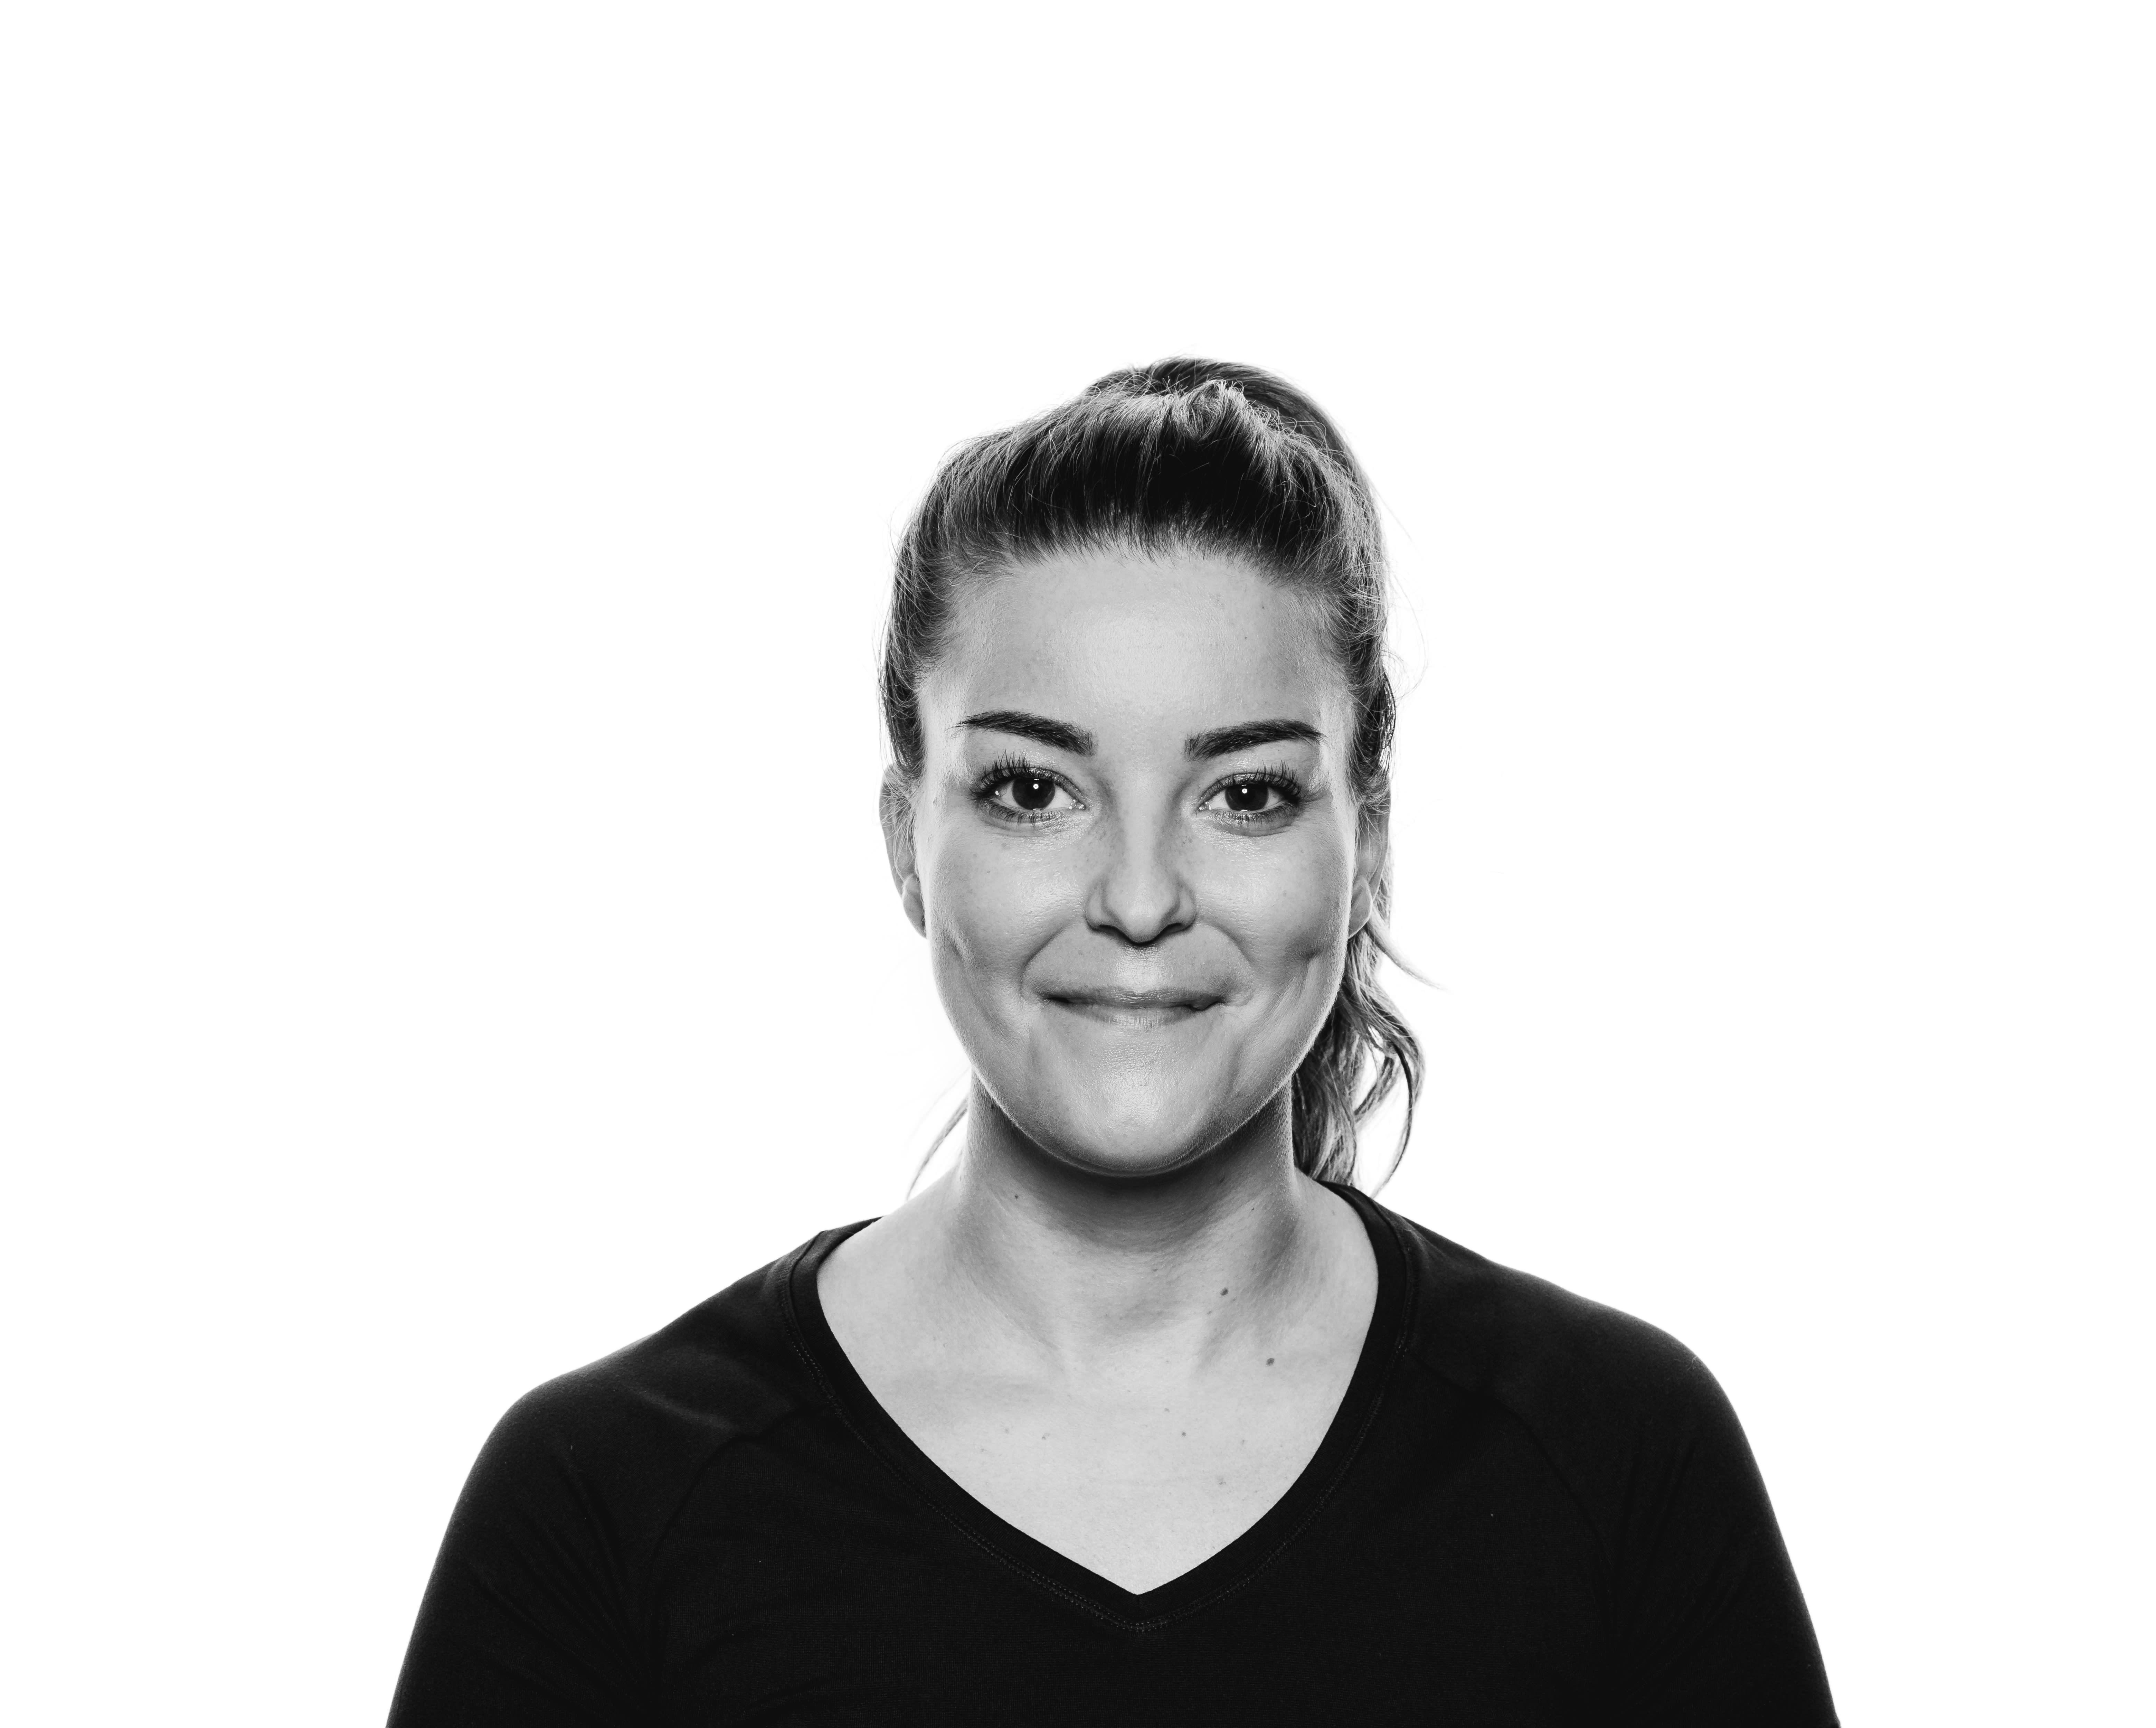 Nynne Schledermann